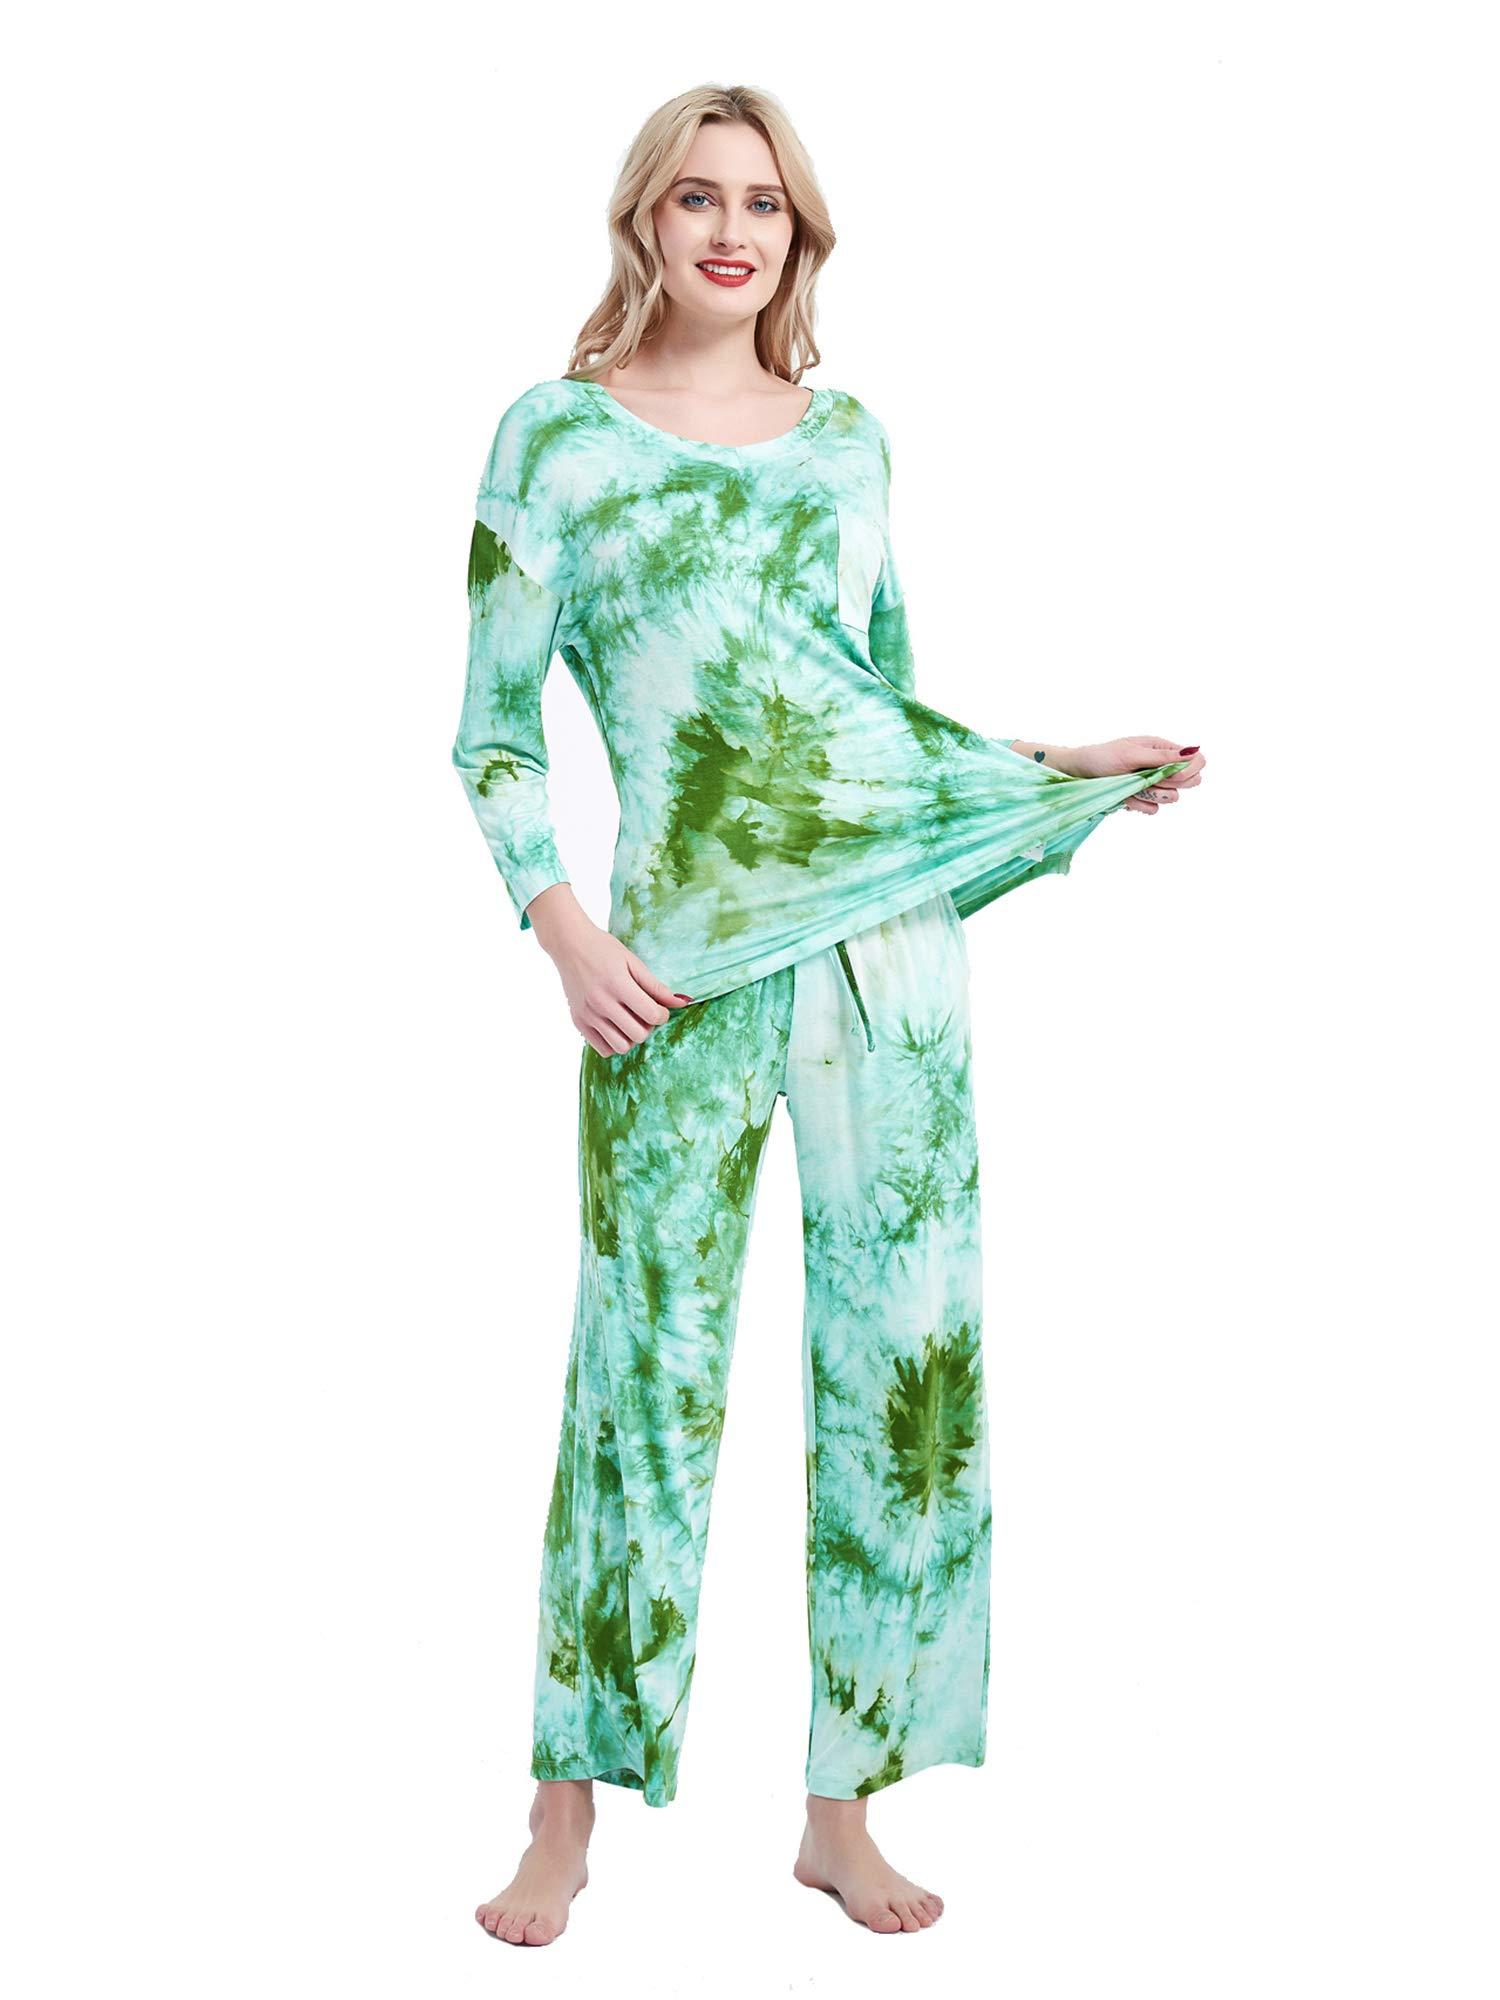 Arcwares Womens Printed Tie Dye Pajamas Set Long Sleeve Tops and Long